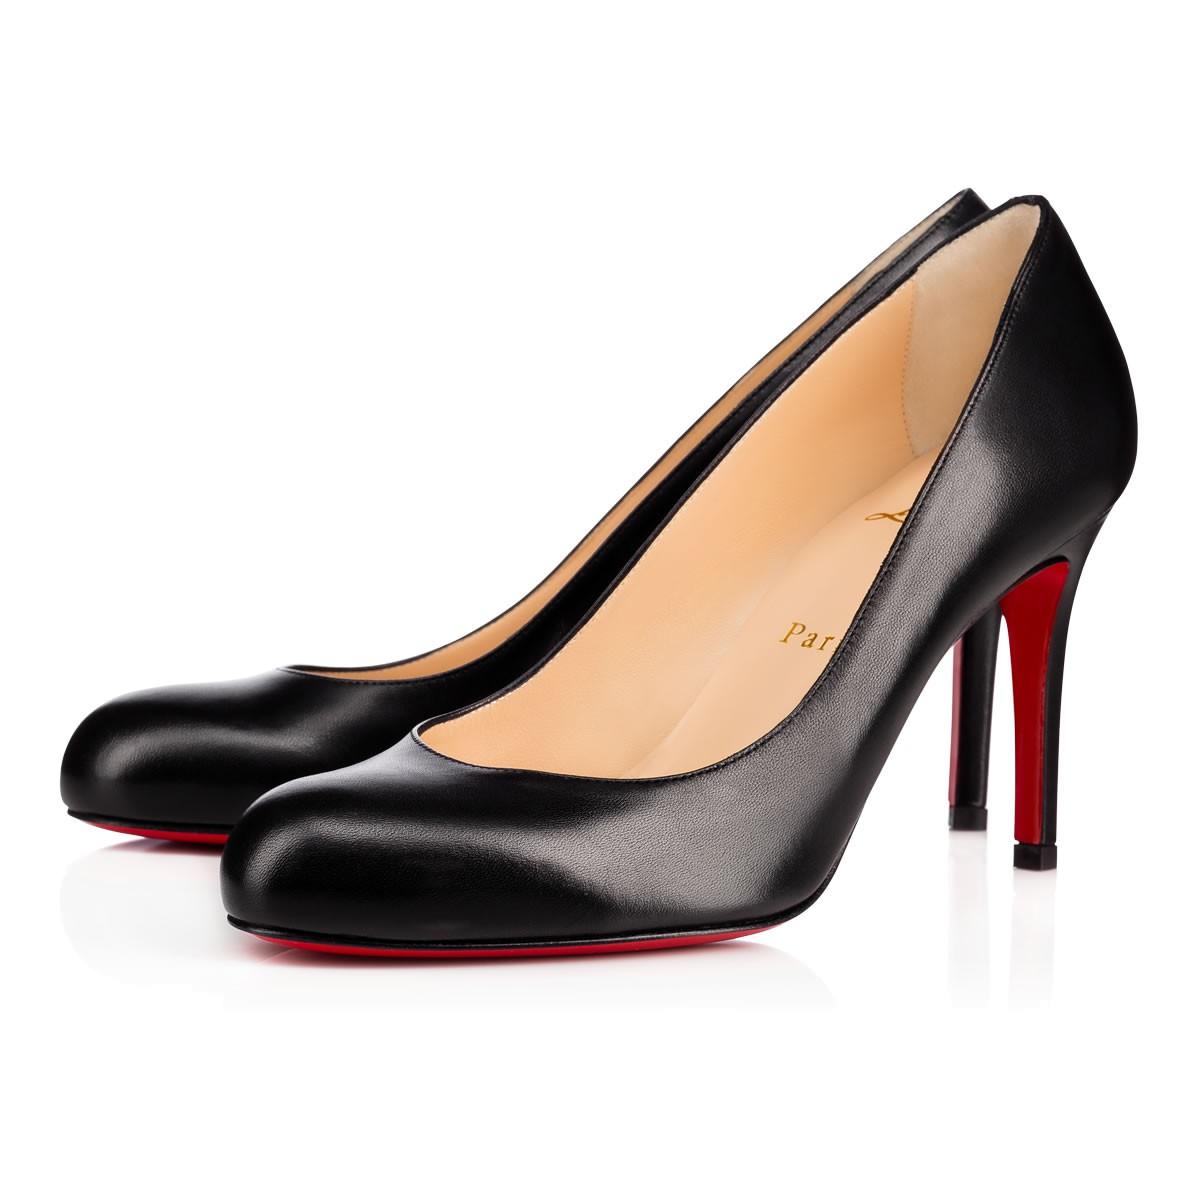 chaussure escarpins louboutin